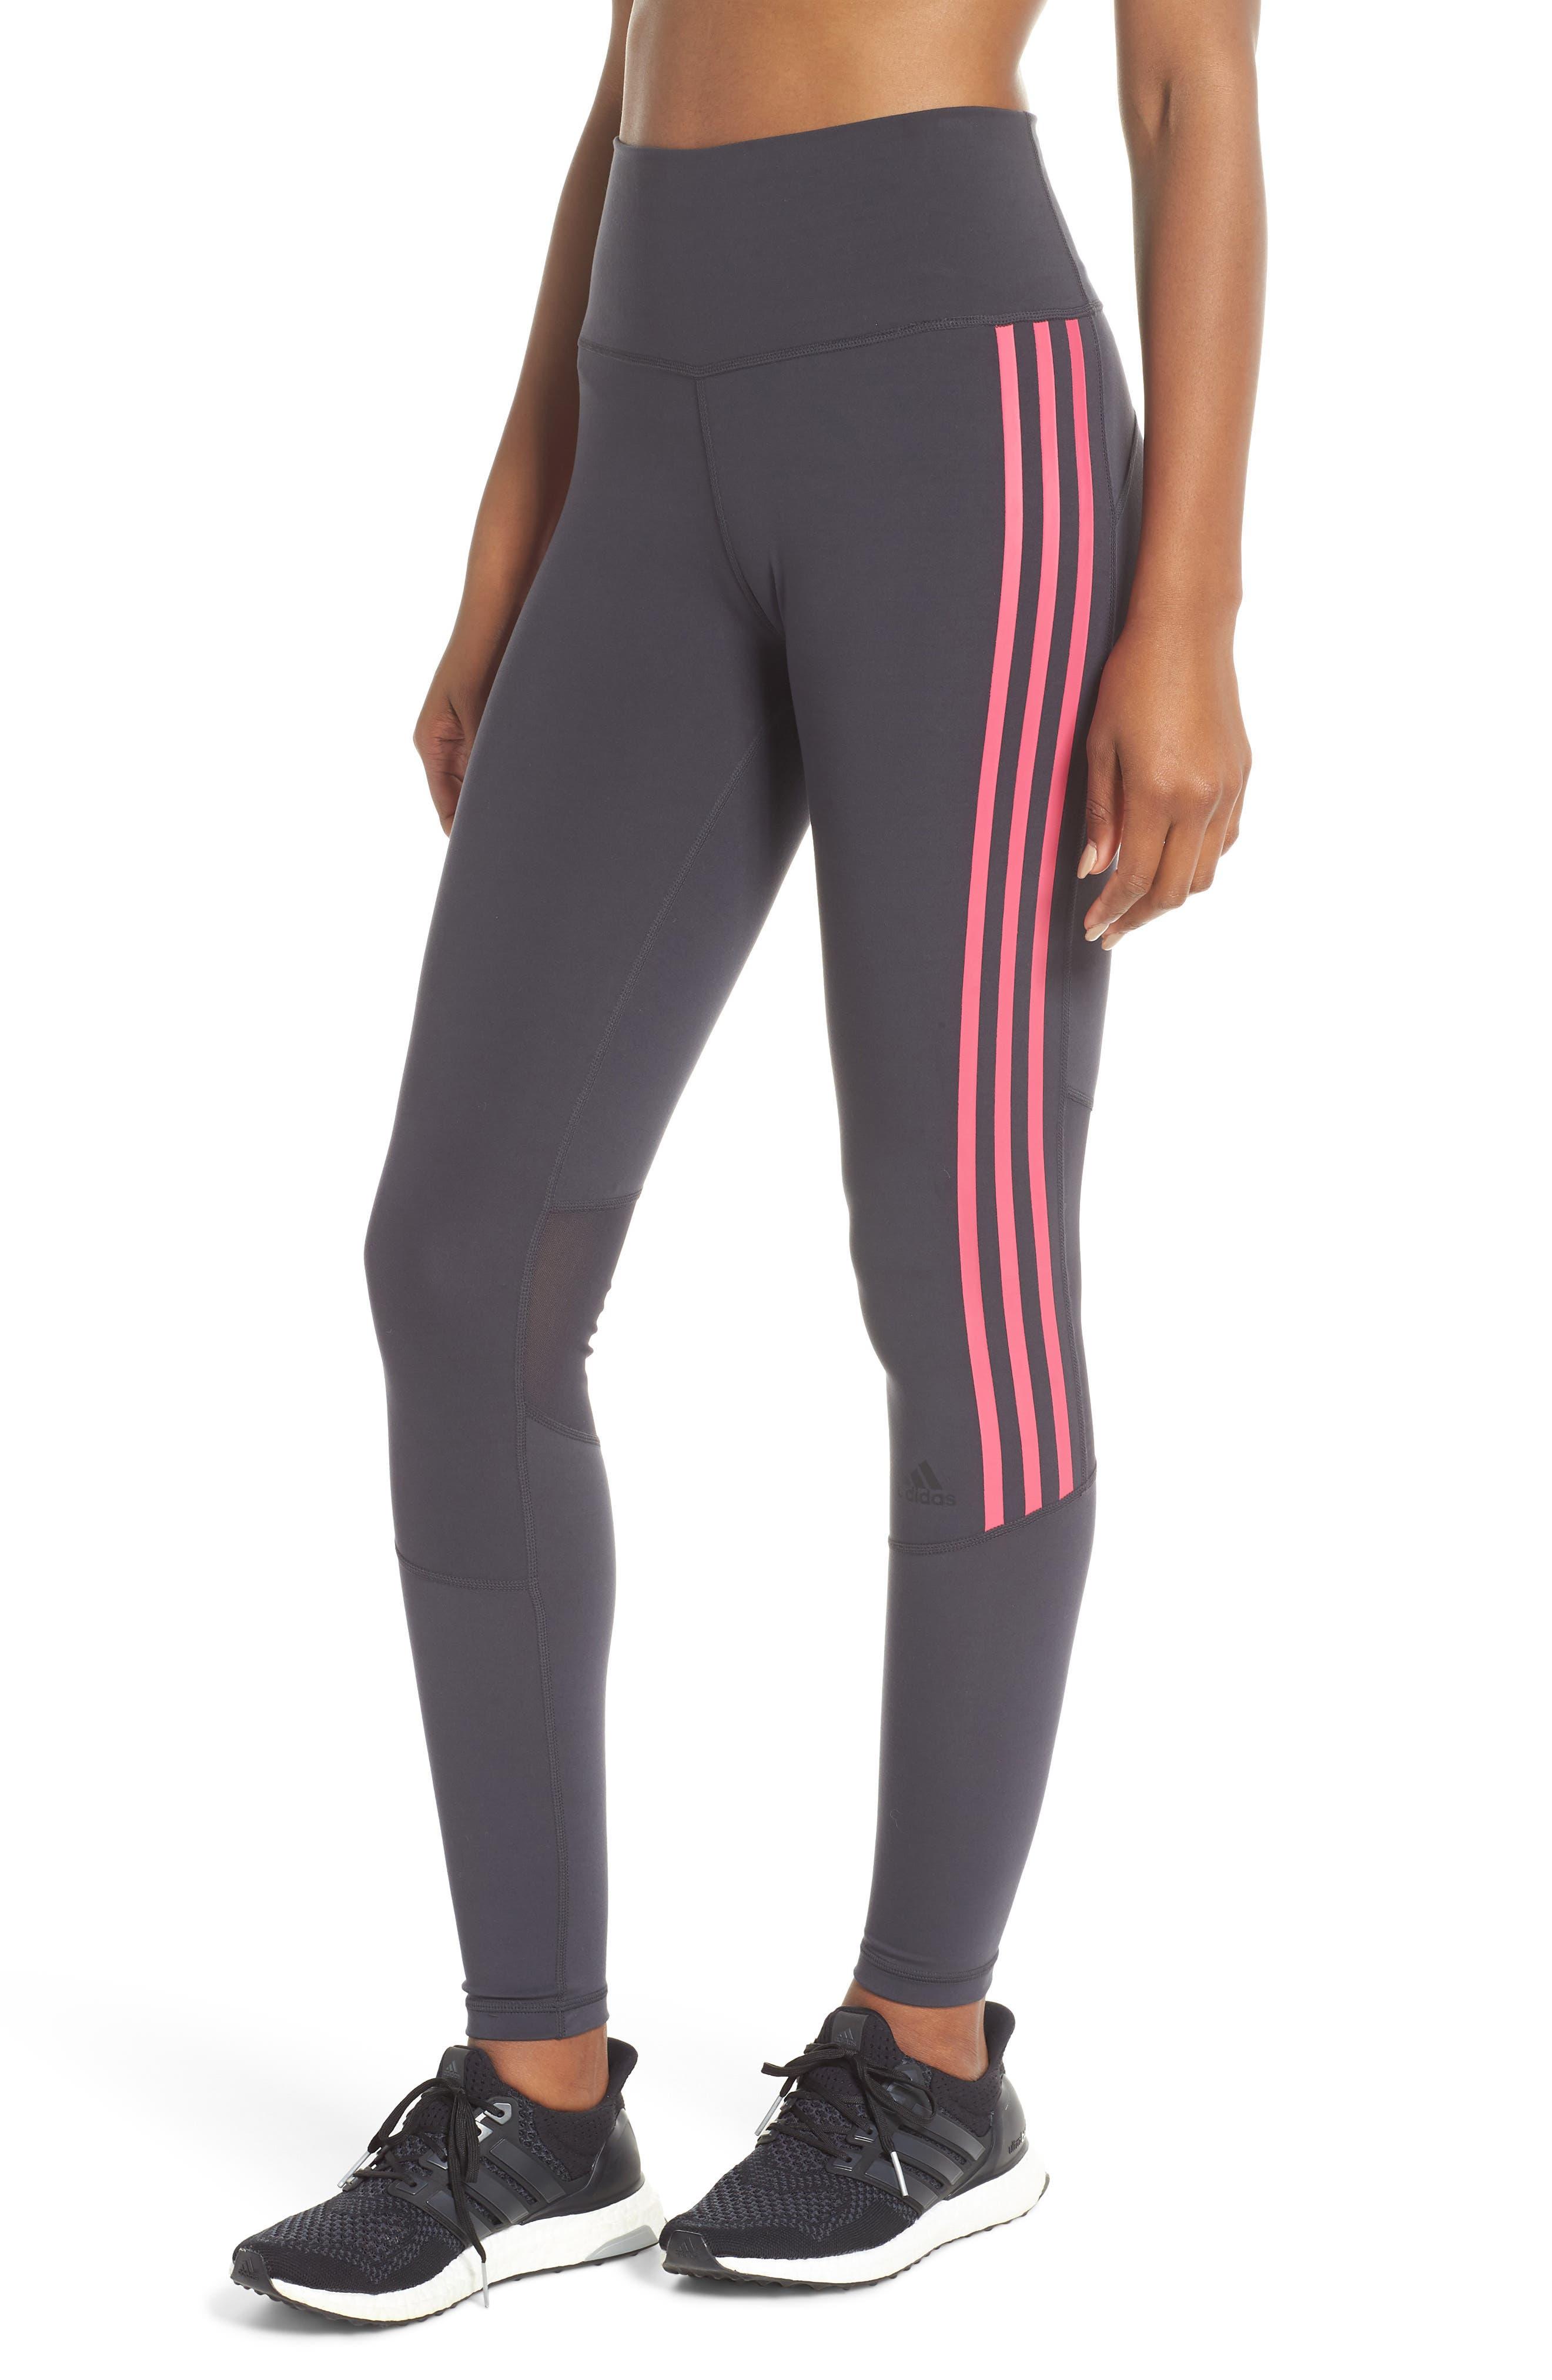 d1e6745b5f Workout Nordstrom Adidas Activewear Clothes Women's amp; z5T8wWAq